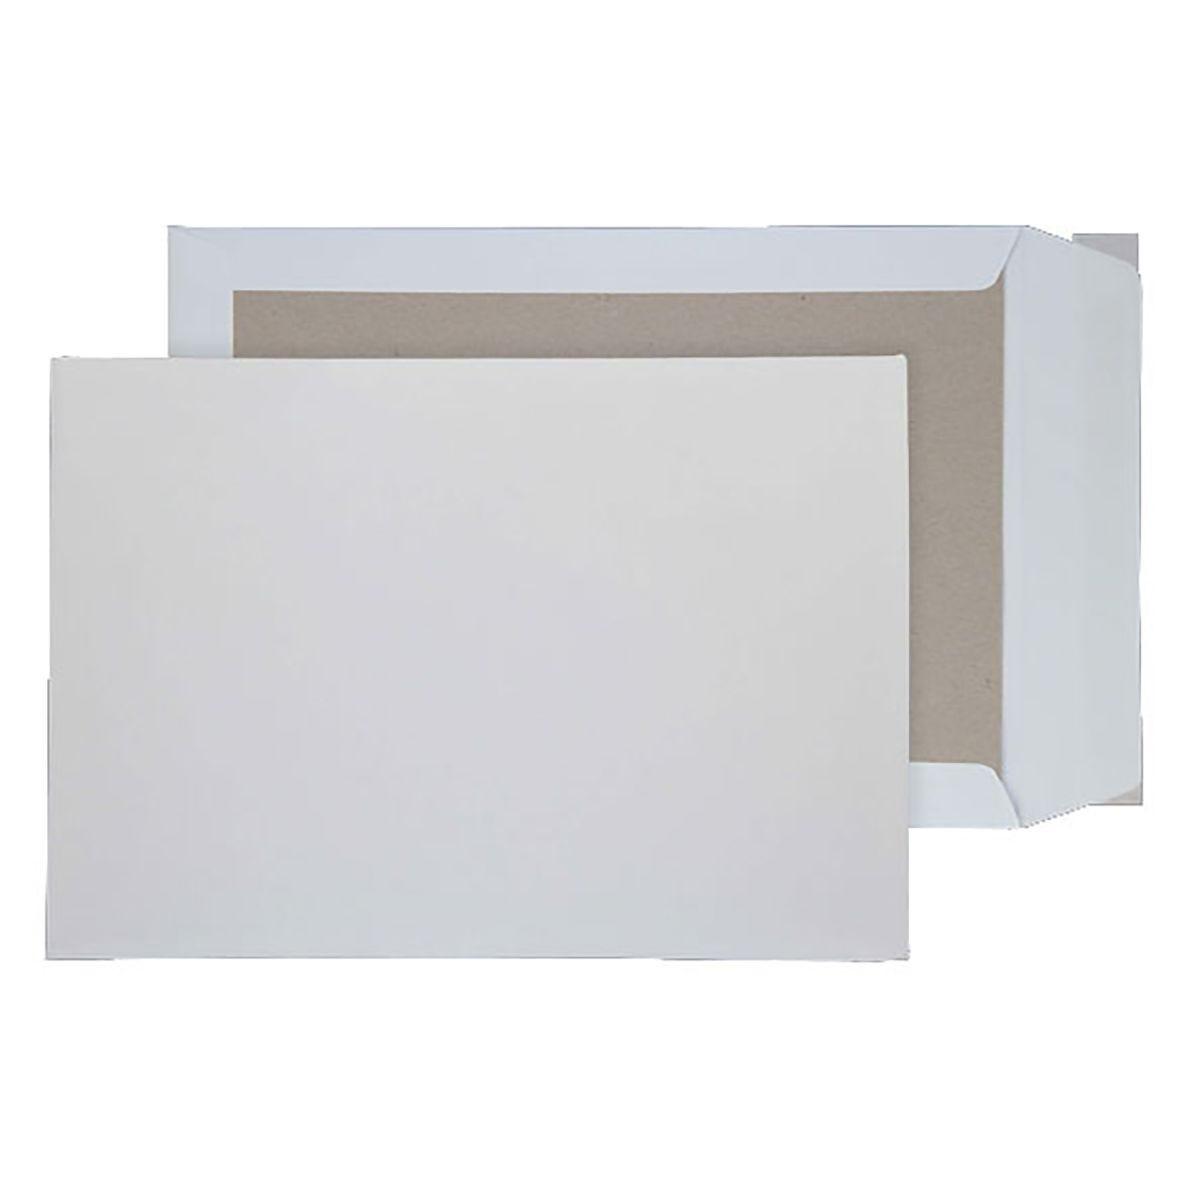 Blake Purely Packaging Board Backed Envelope C3 120gsm Peel and Seal Pack of 100